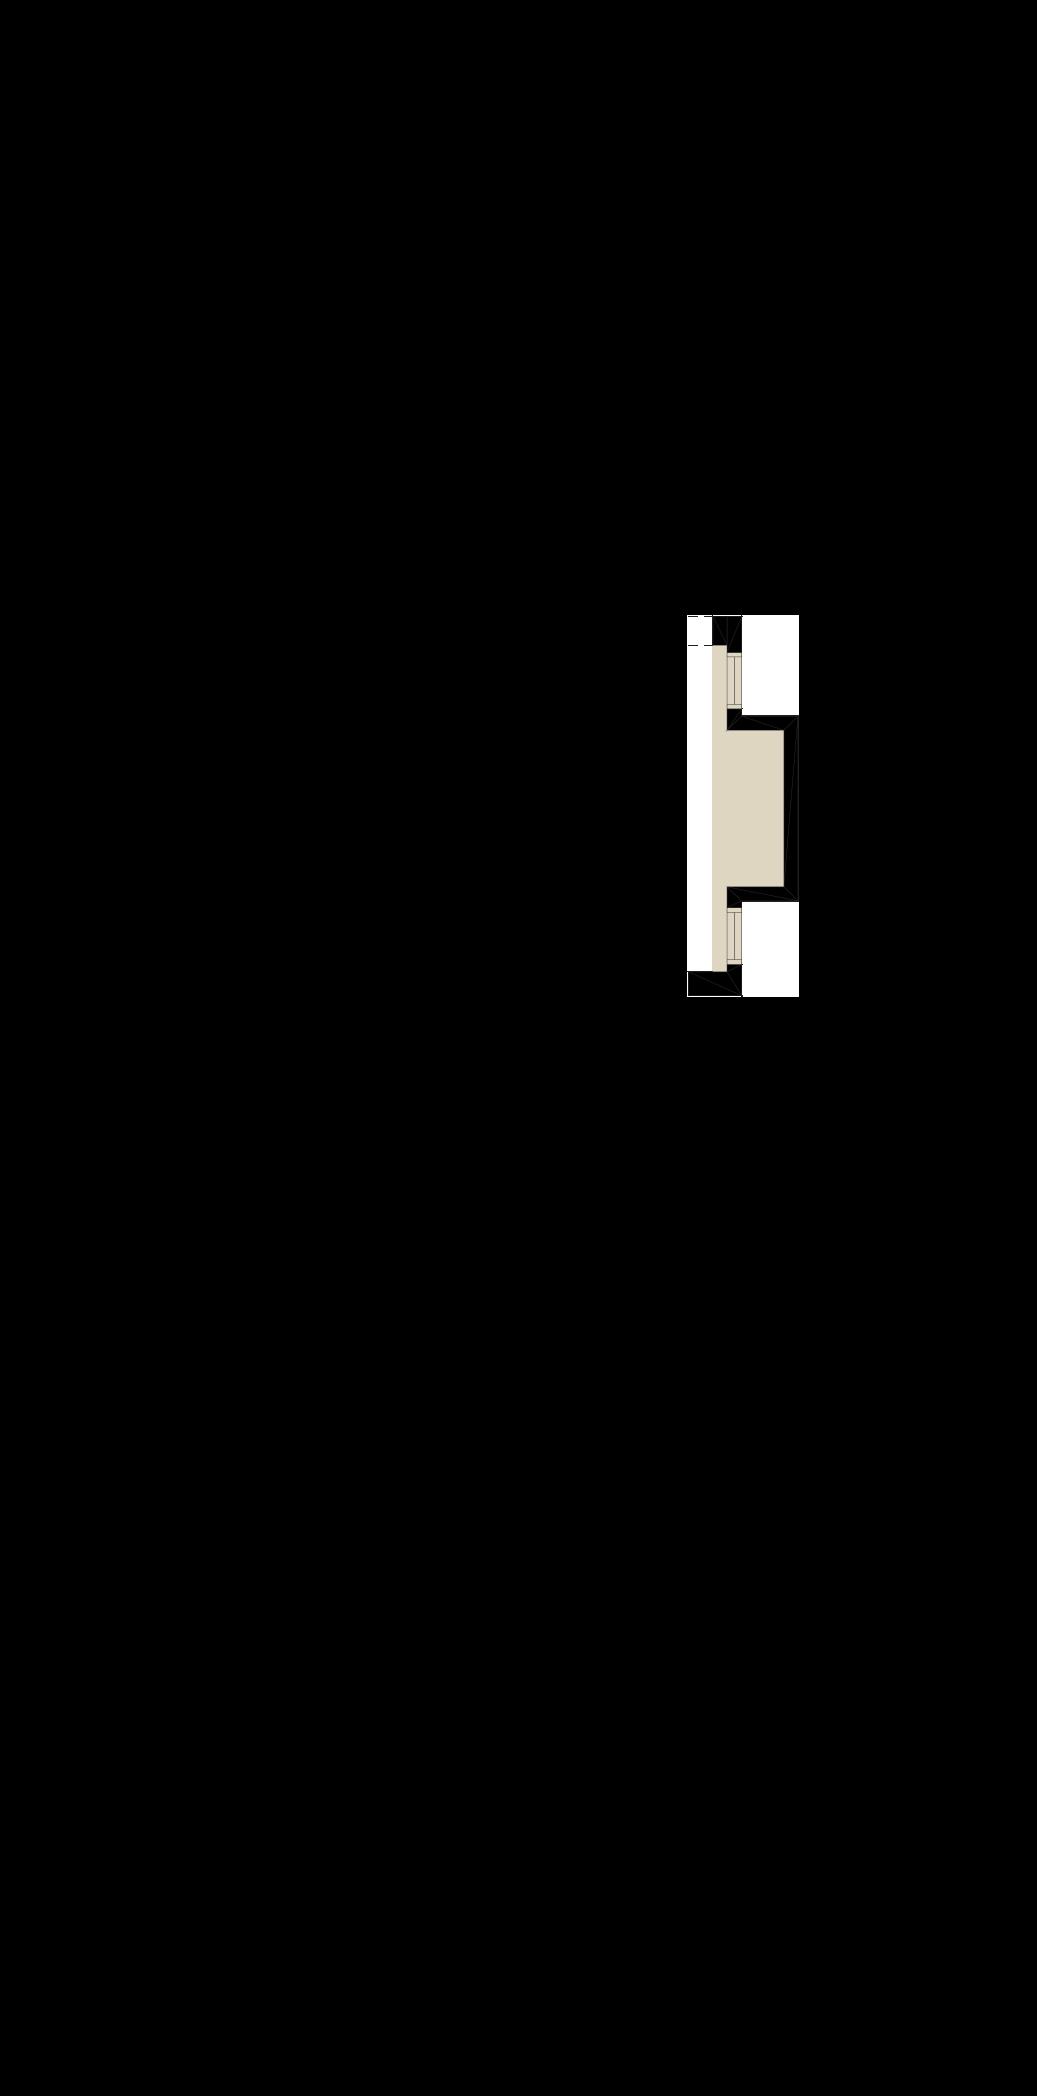 Flex Room Cantilever Adds 13 Sq Ft